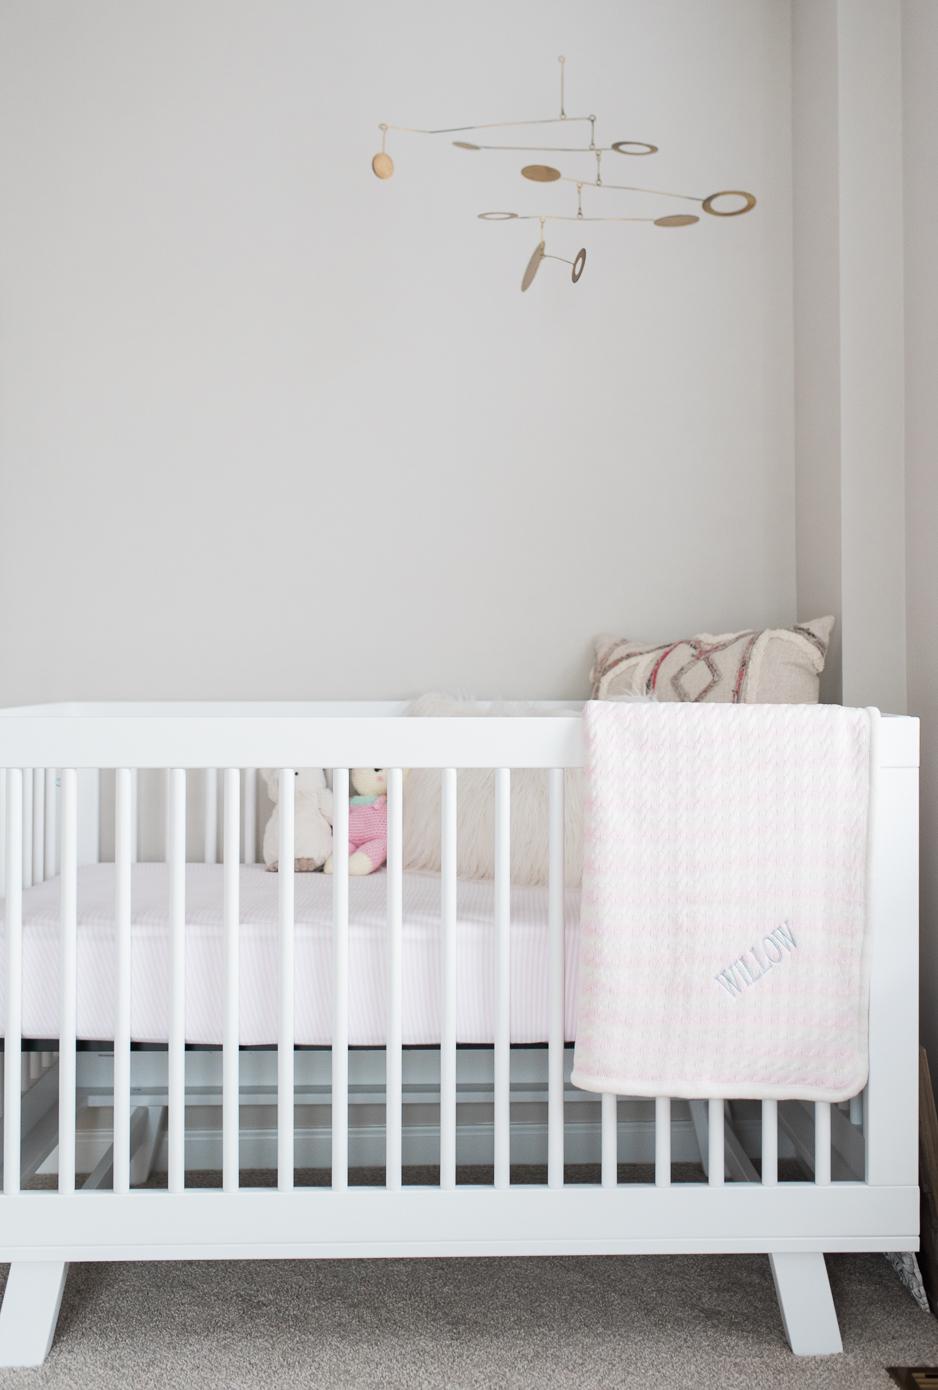 Baltimore-Maryland-Newborn-lifestyle-photographer-breanna kuhlmann-1.jpg